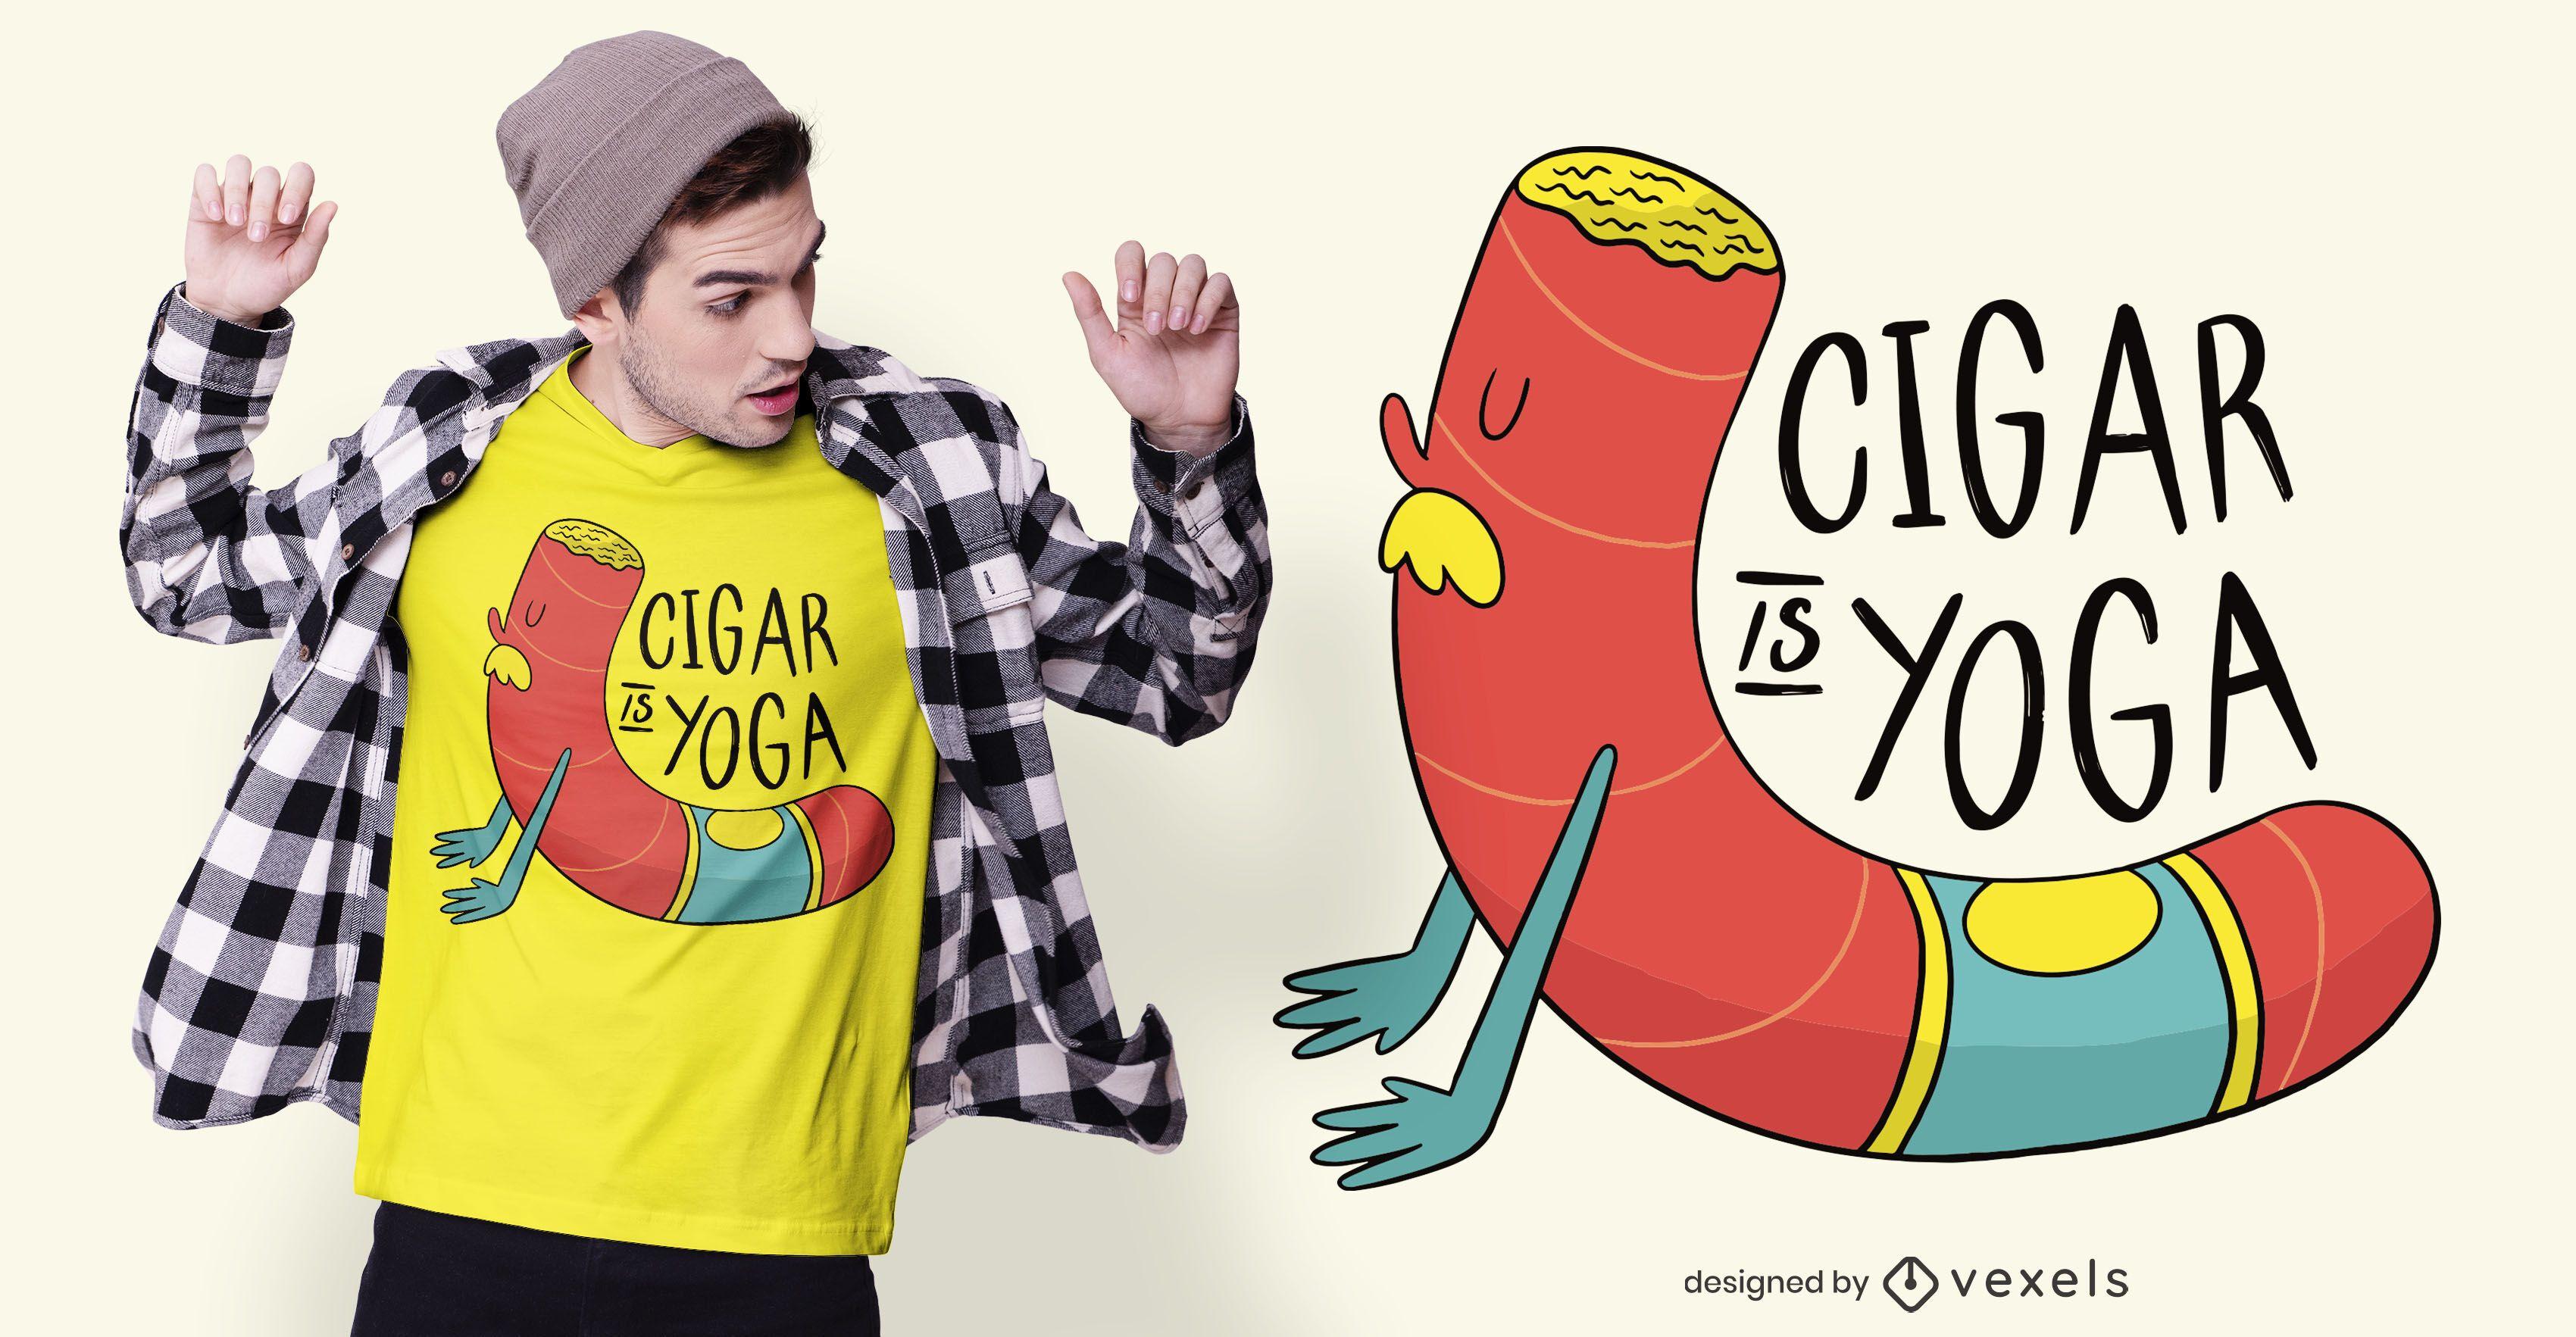 Cigar Yoga T-shirt Design